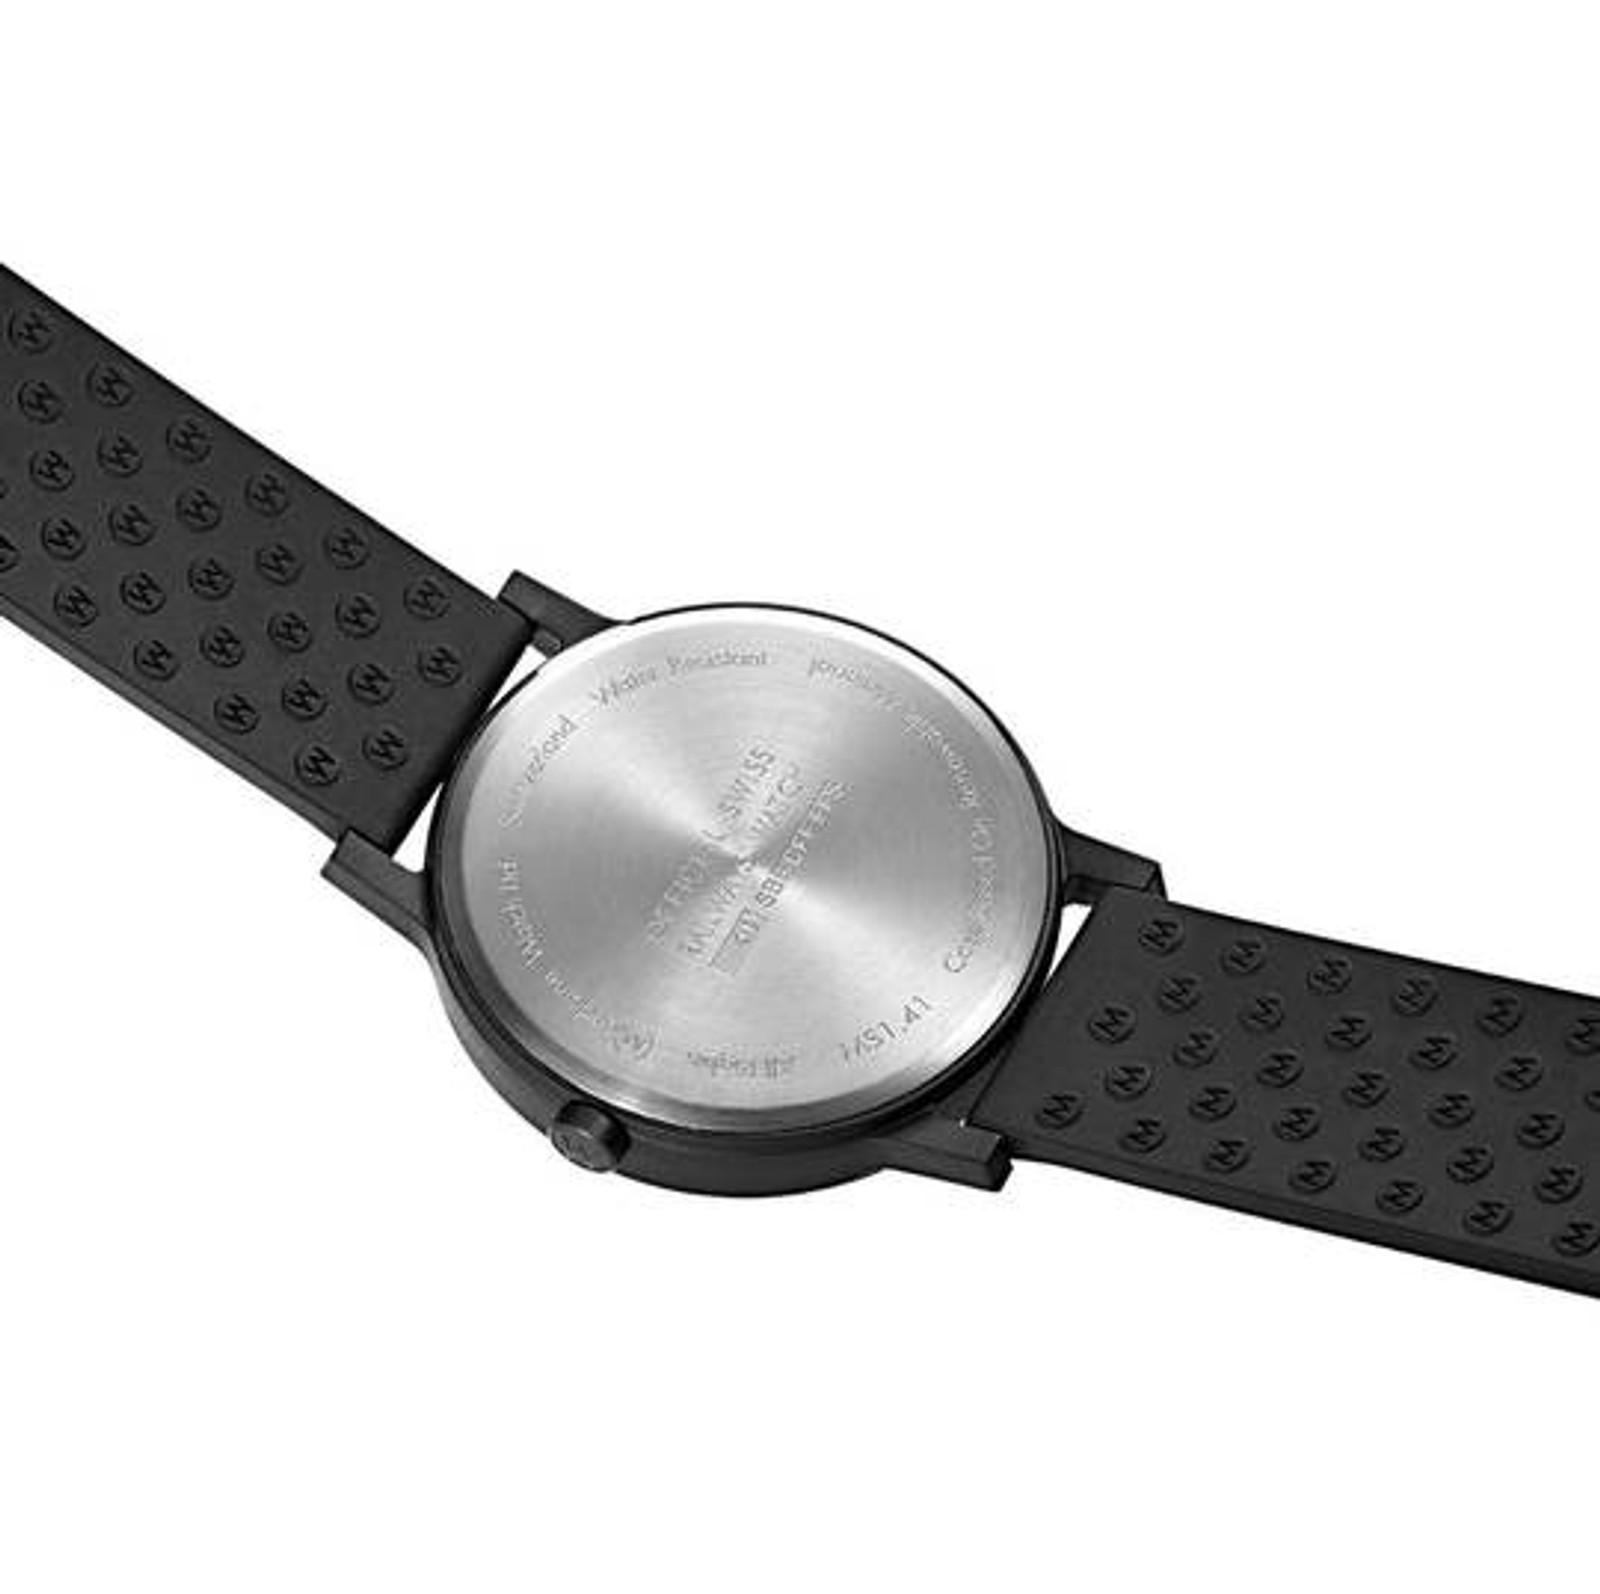 Essence 32mm - Black dial